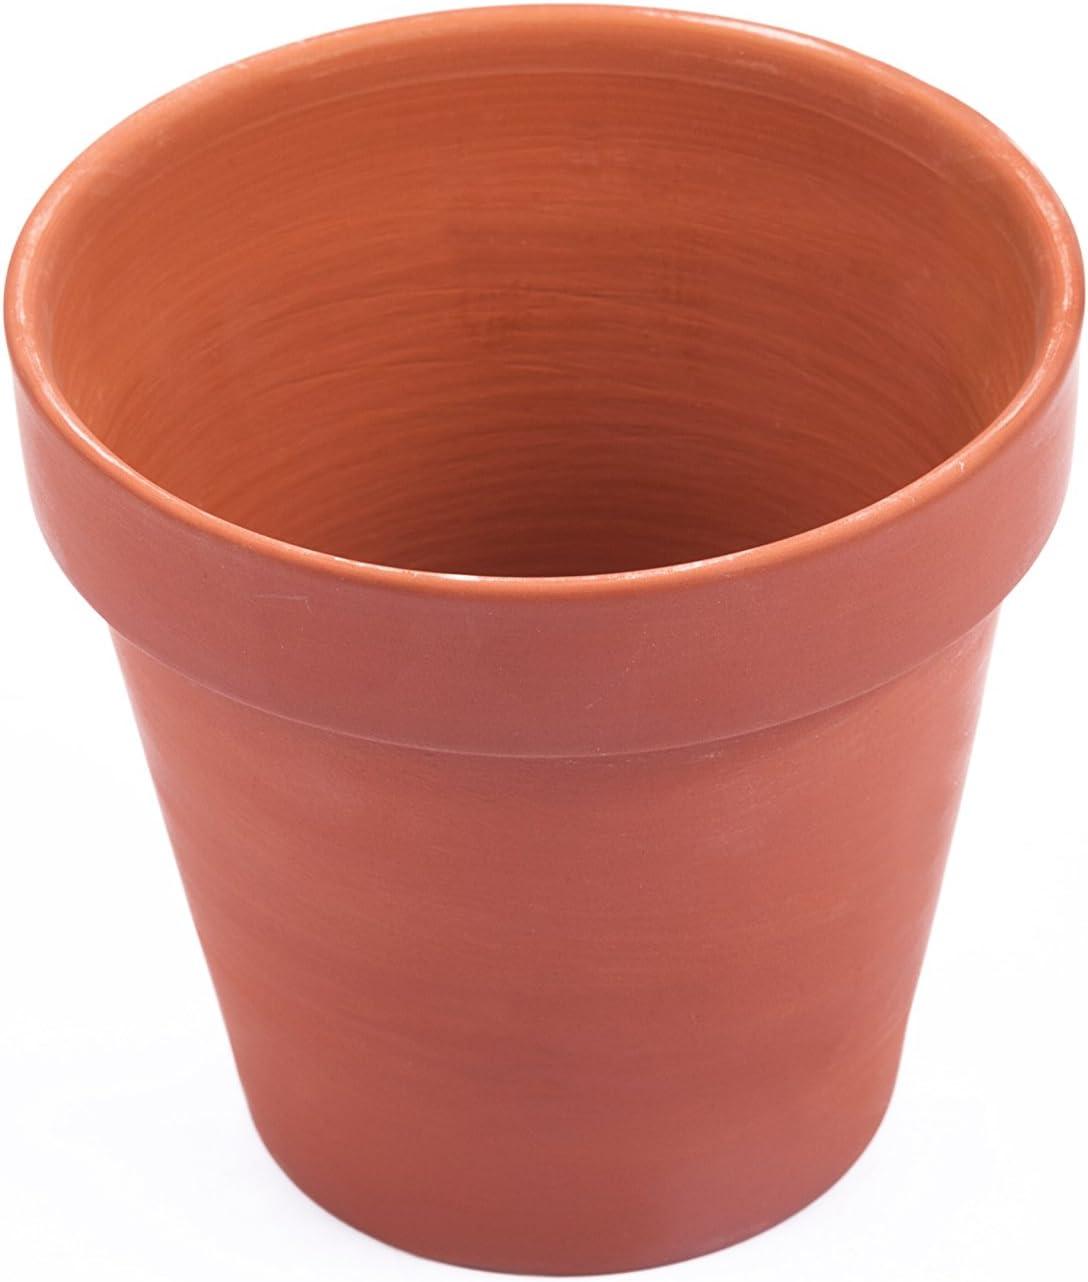 Mr. Garden Clay Pots 3-Inch,Terracotta Pot Clay Ceramic Pottery Planter Cactus Flower Pots Succulent Pot- Great for Plants,Crafts,Wedding Favor ,5Pack